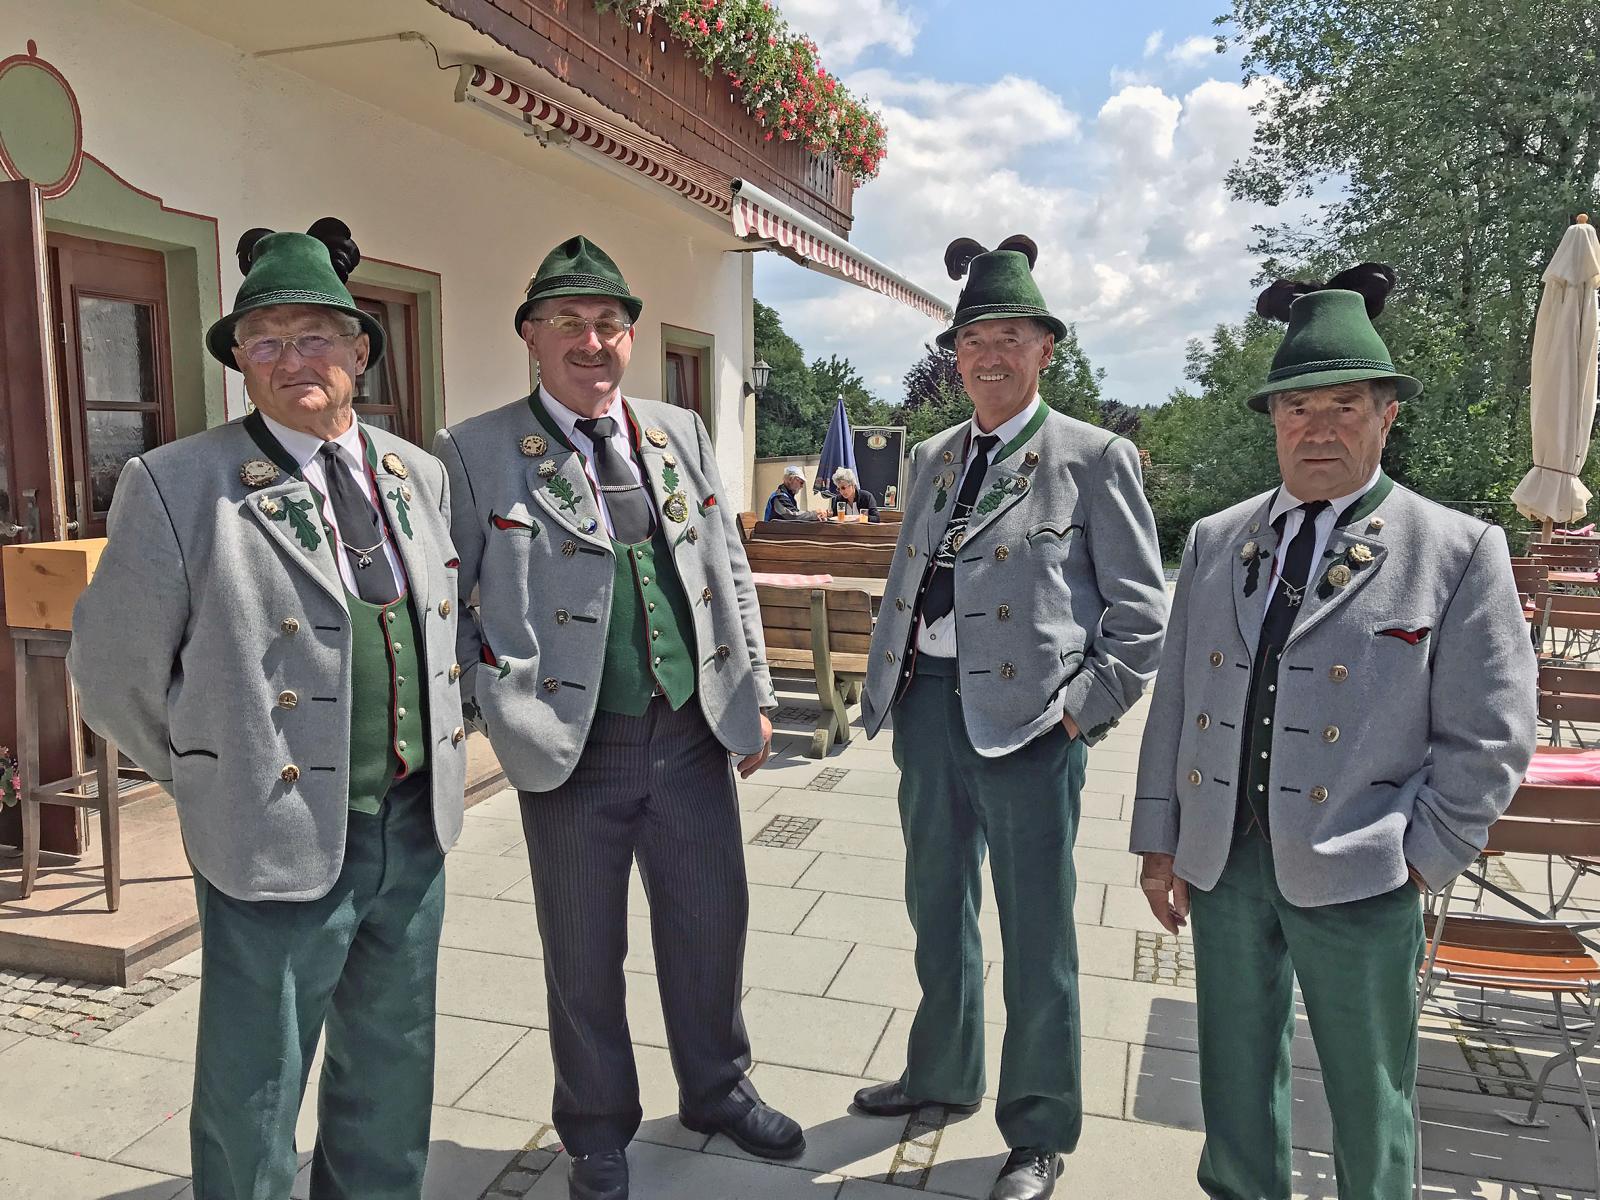 Beerdigung Ehrenvorstand Rupert Sonnenhuber, Amerang (7)